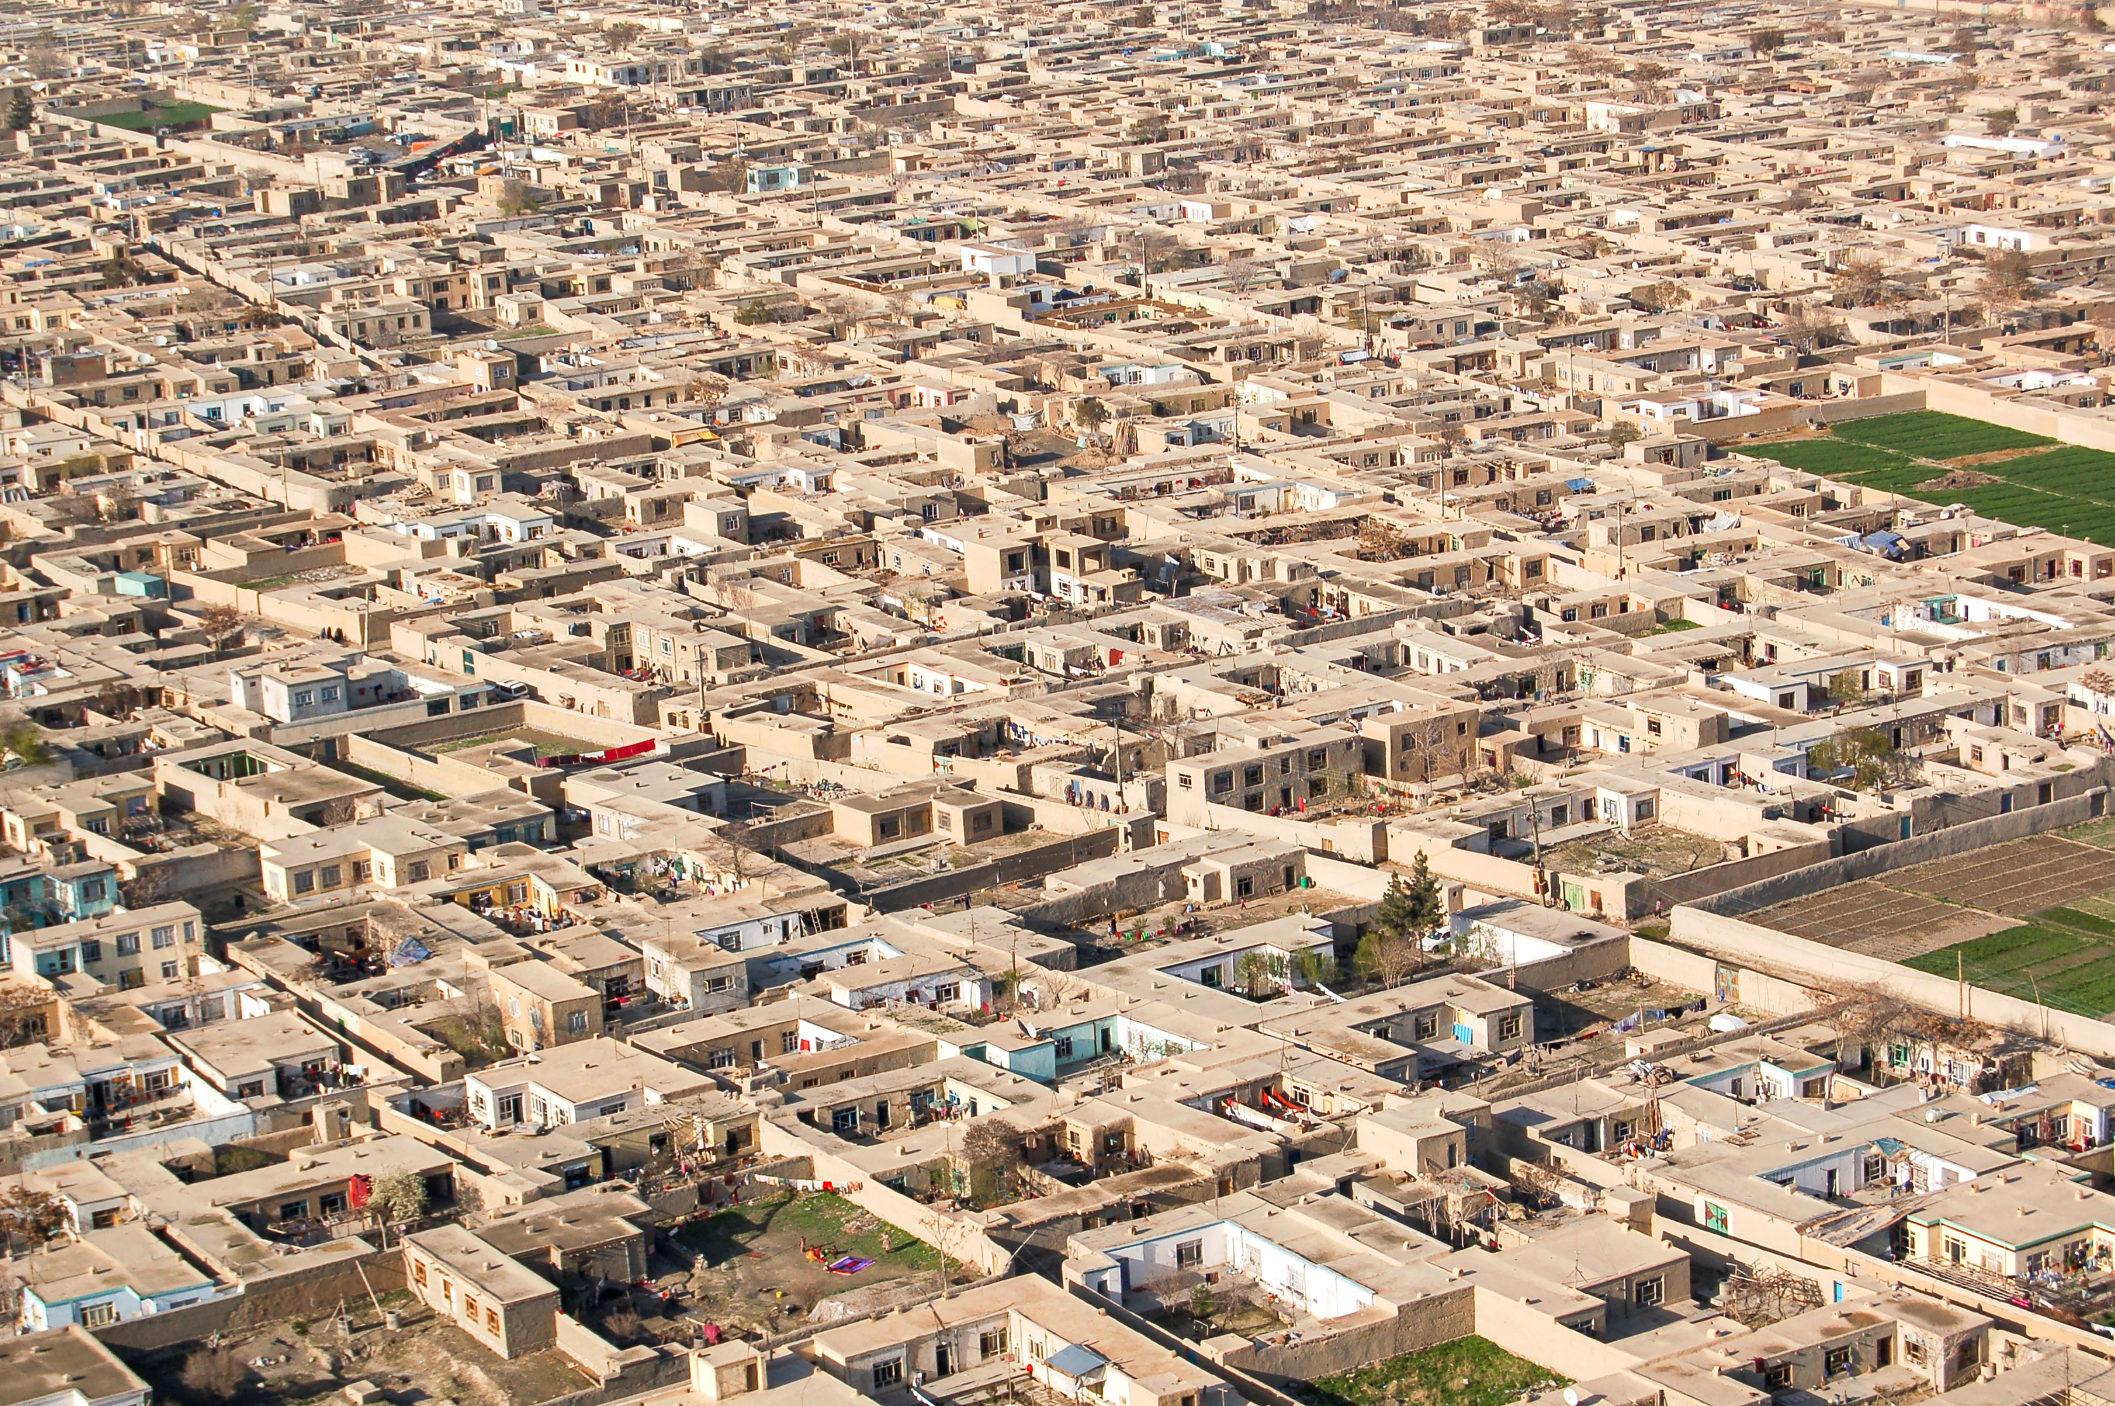 Afghanistan [Shutterstock]